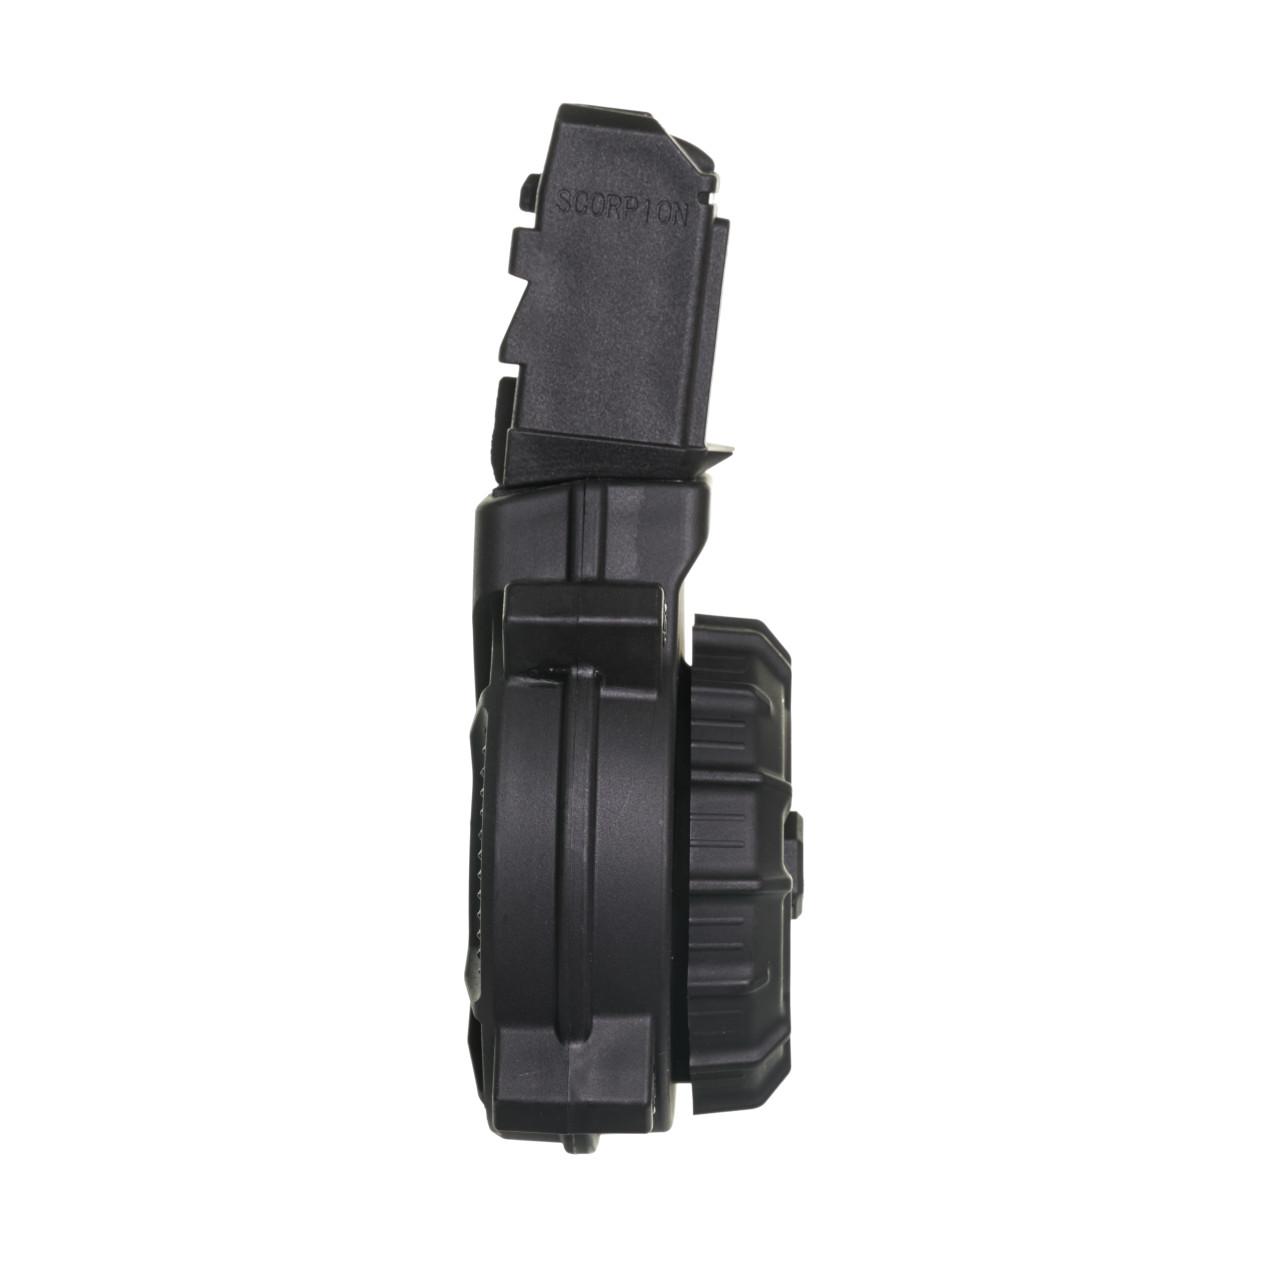 CZ® Scorpion 9mm (50) Rd - Black Polymer Drum